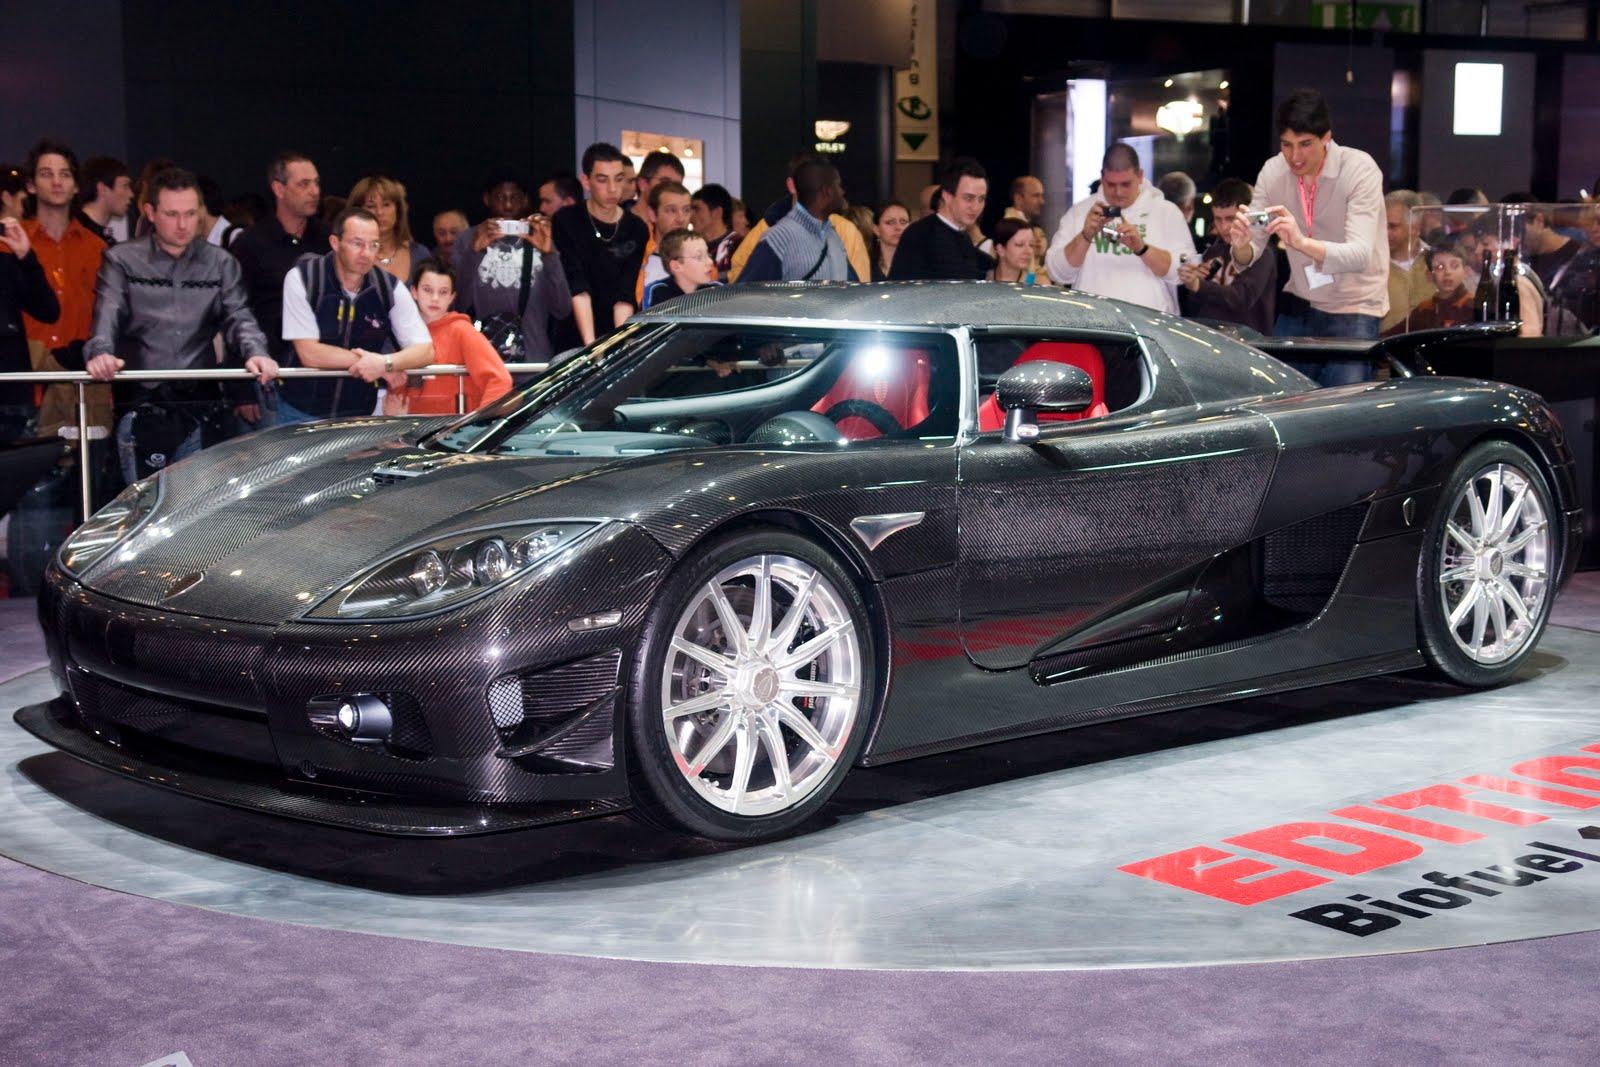 Koenigsegg CCXR - the new